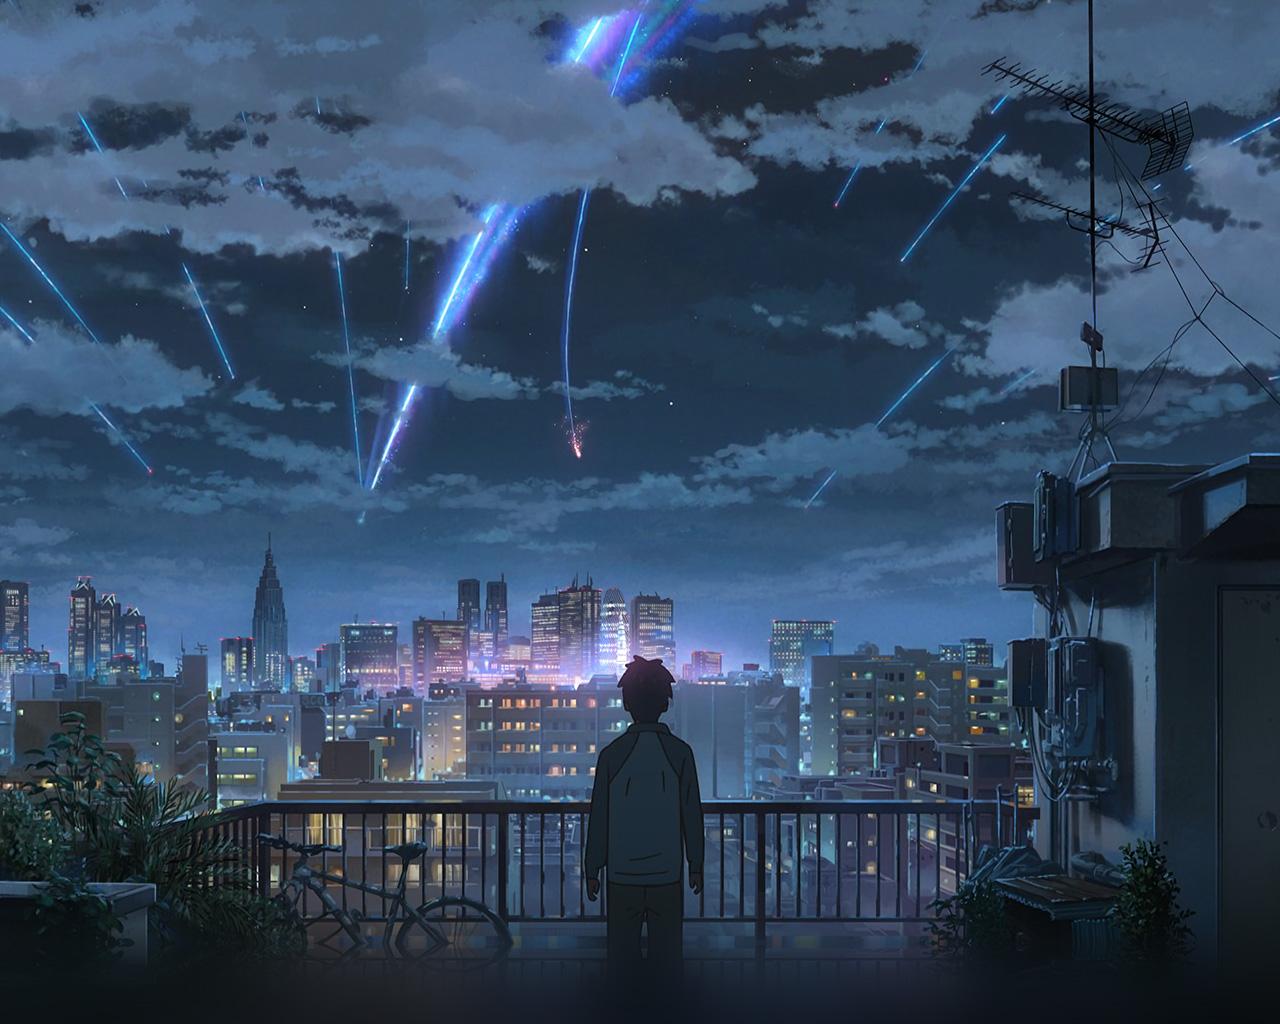 wallpaper for desktop, laptop | aw28-yourname-night-anime ...